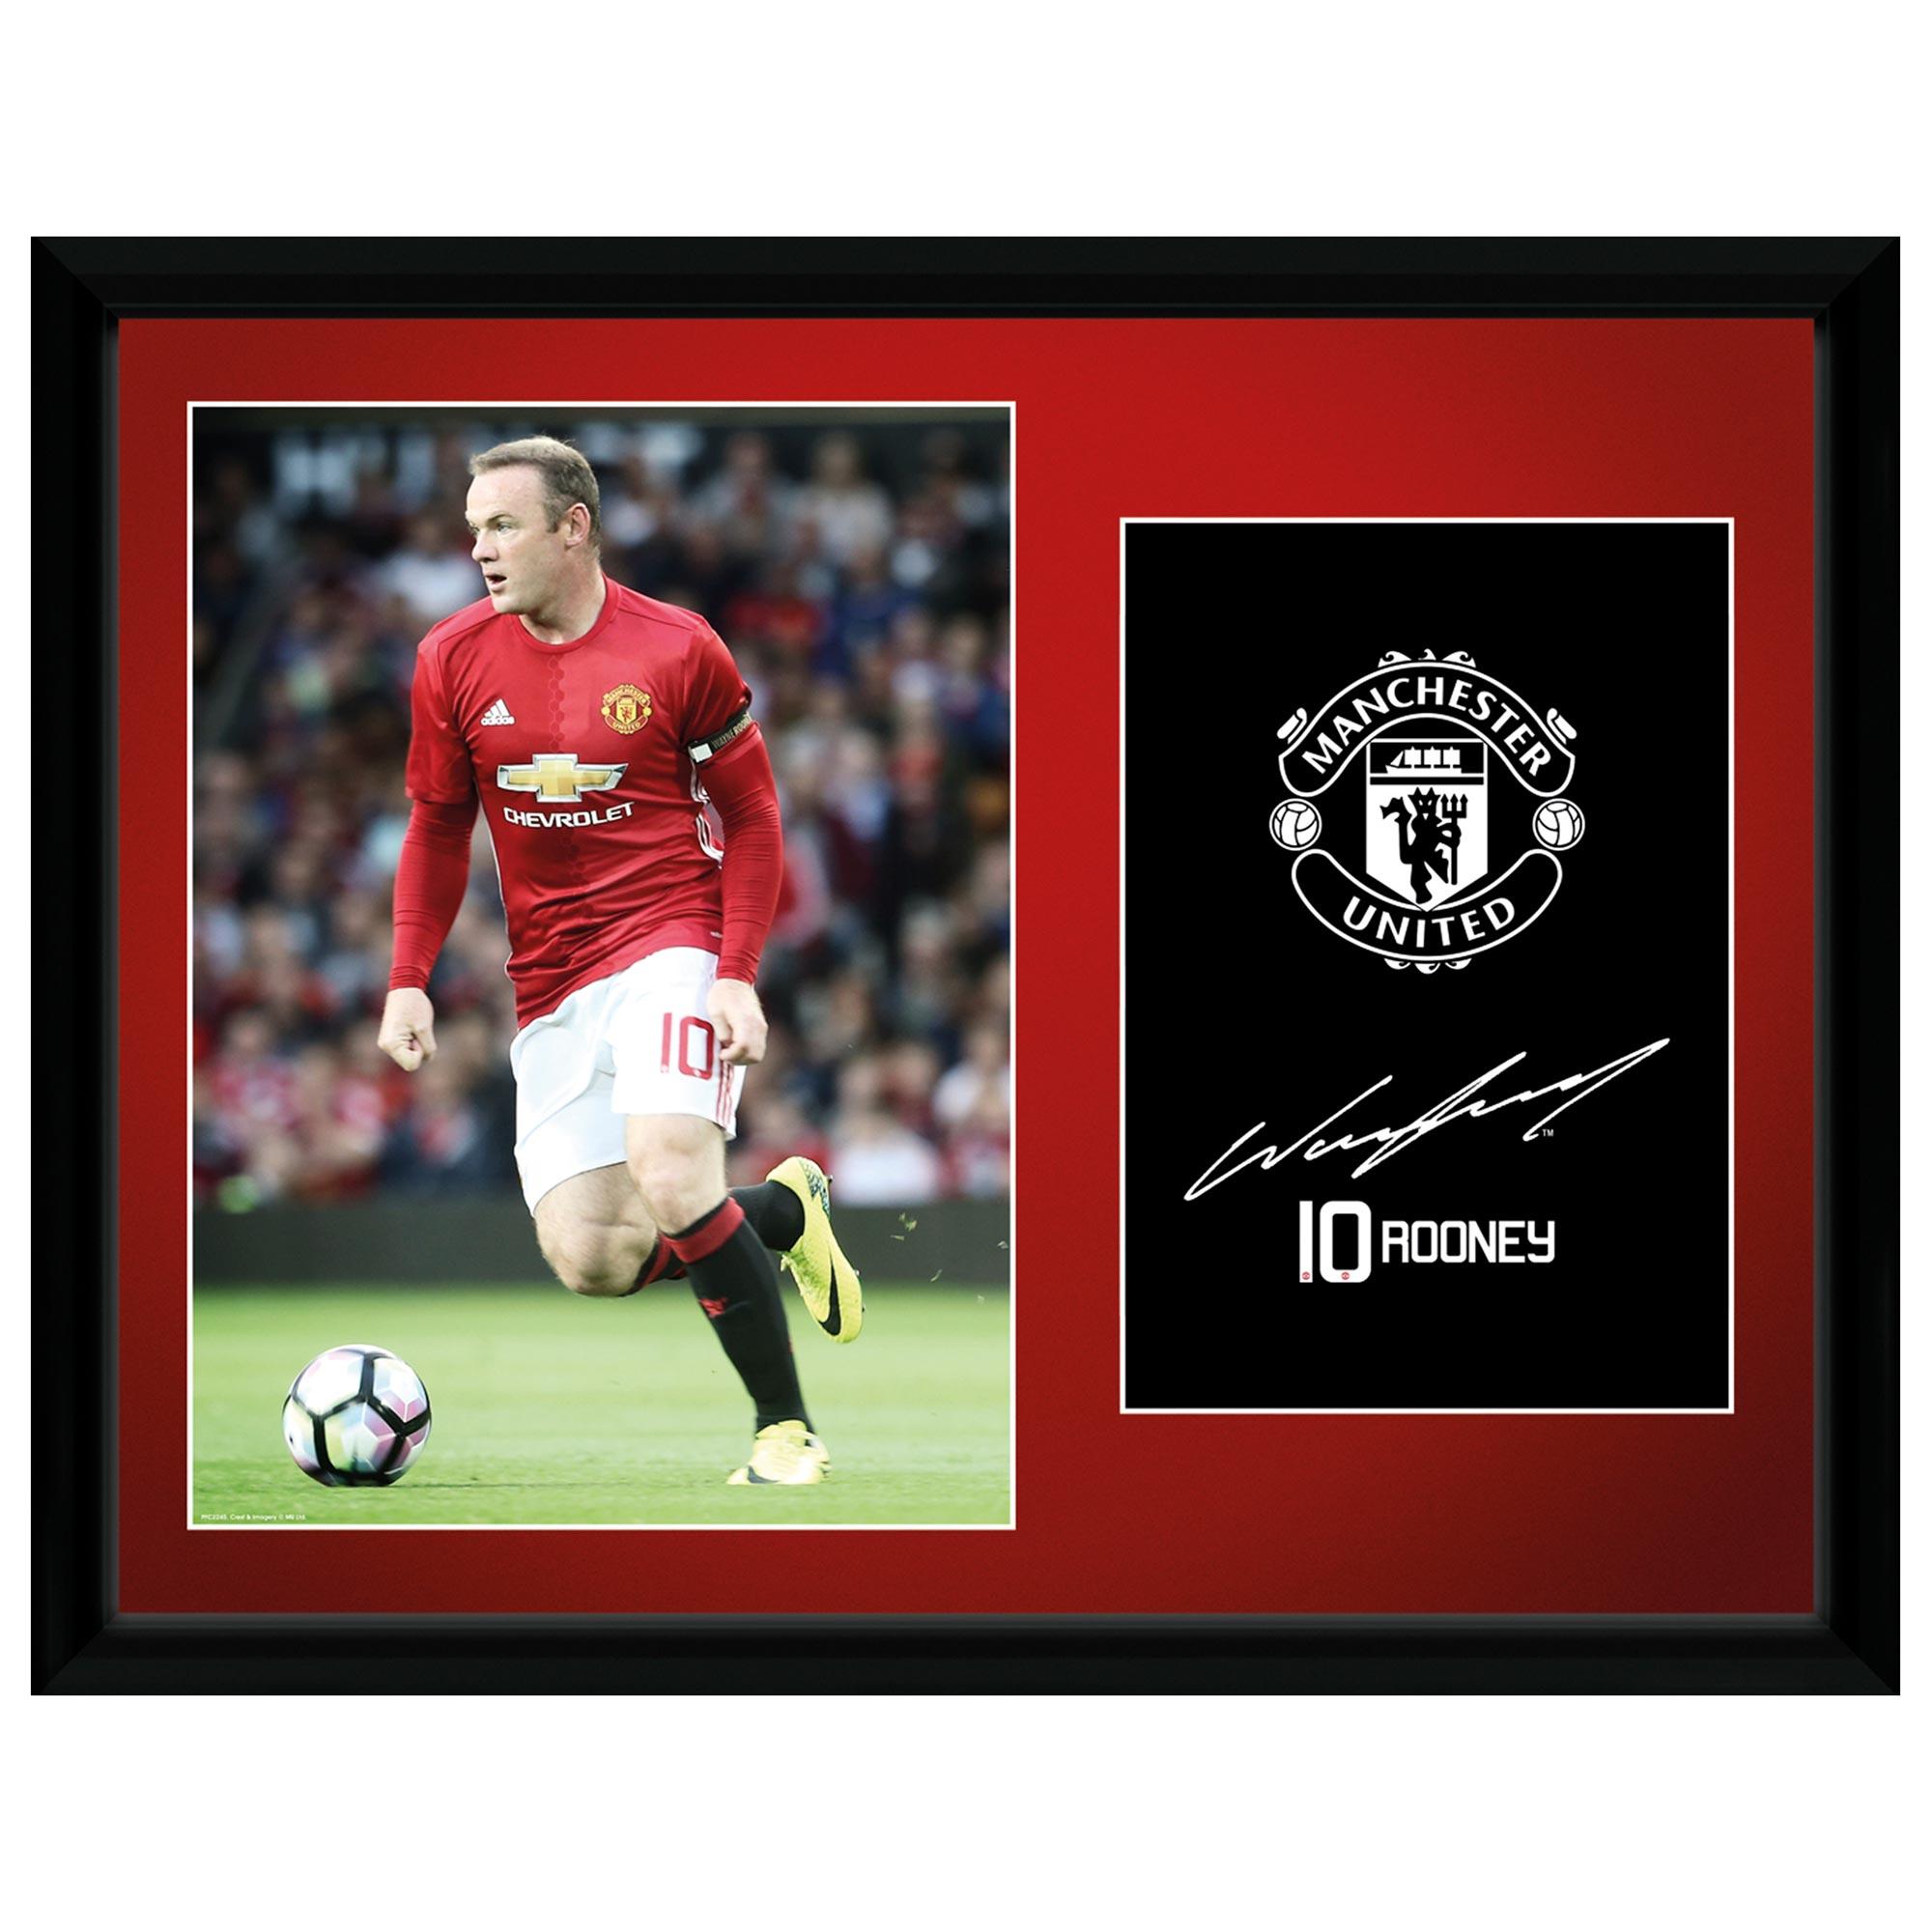 Manchester United 16-17 Rooney Framed Print 16 x 12